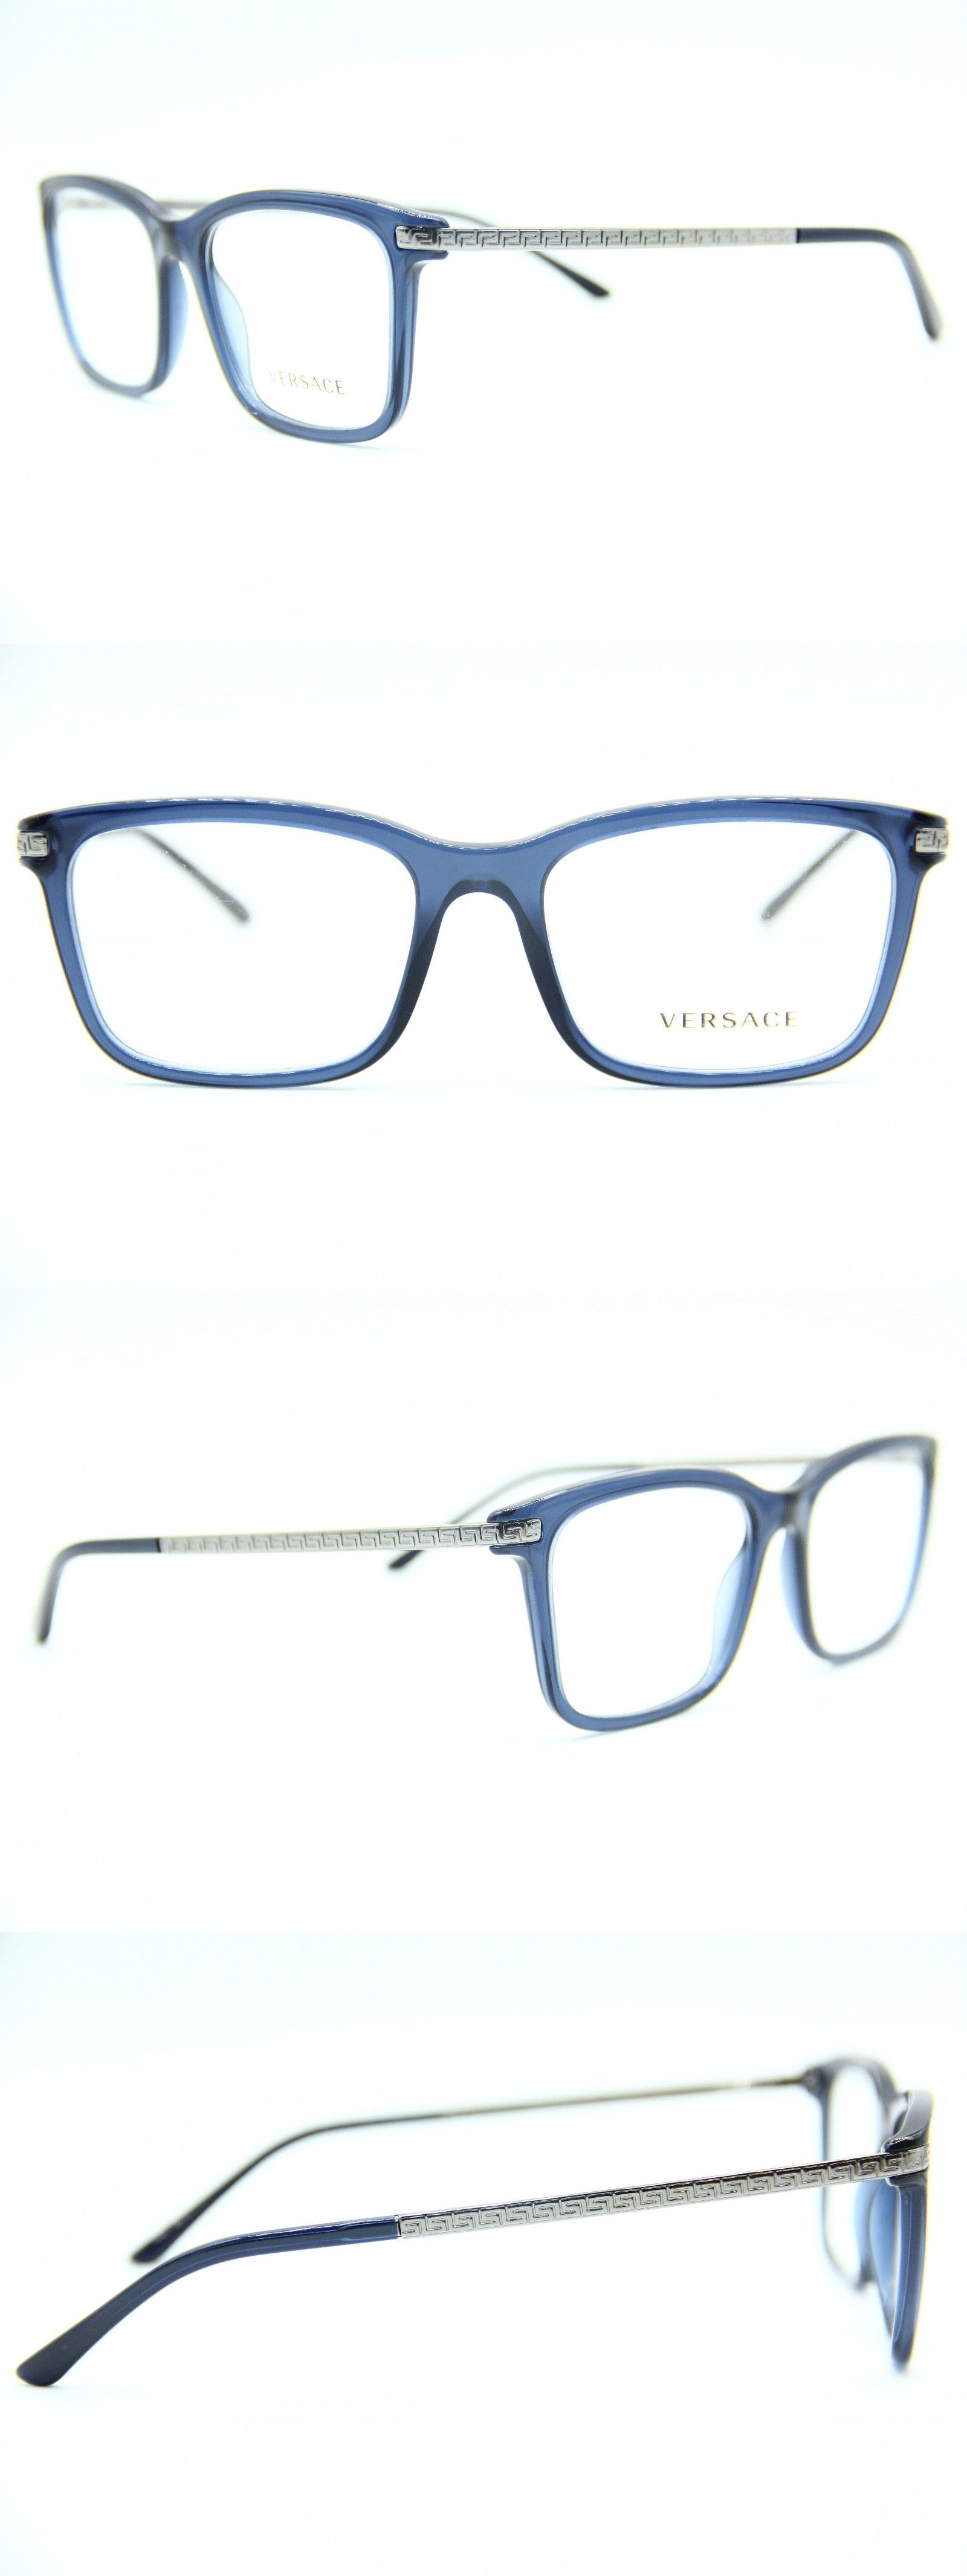 0ed7881b98e1 Vision Care 31414  New Versace Mod. 3210 5111 Blue Eyeglasses Authentic  Mod.3210